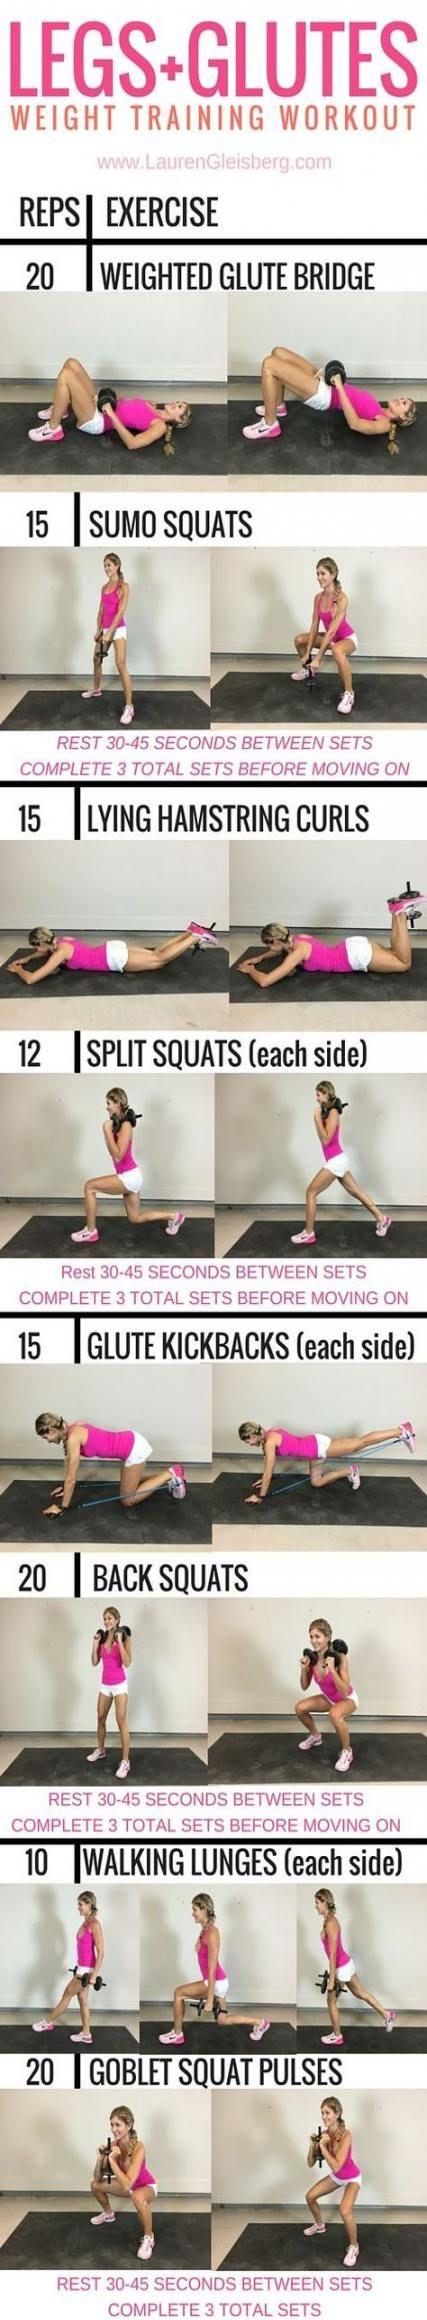 Fitness motivation body training diet 66+ Ideas #motivation #fitness #diet